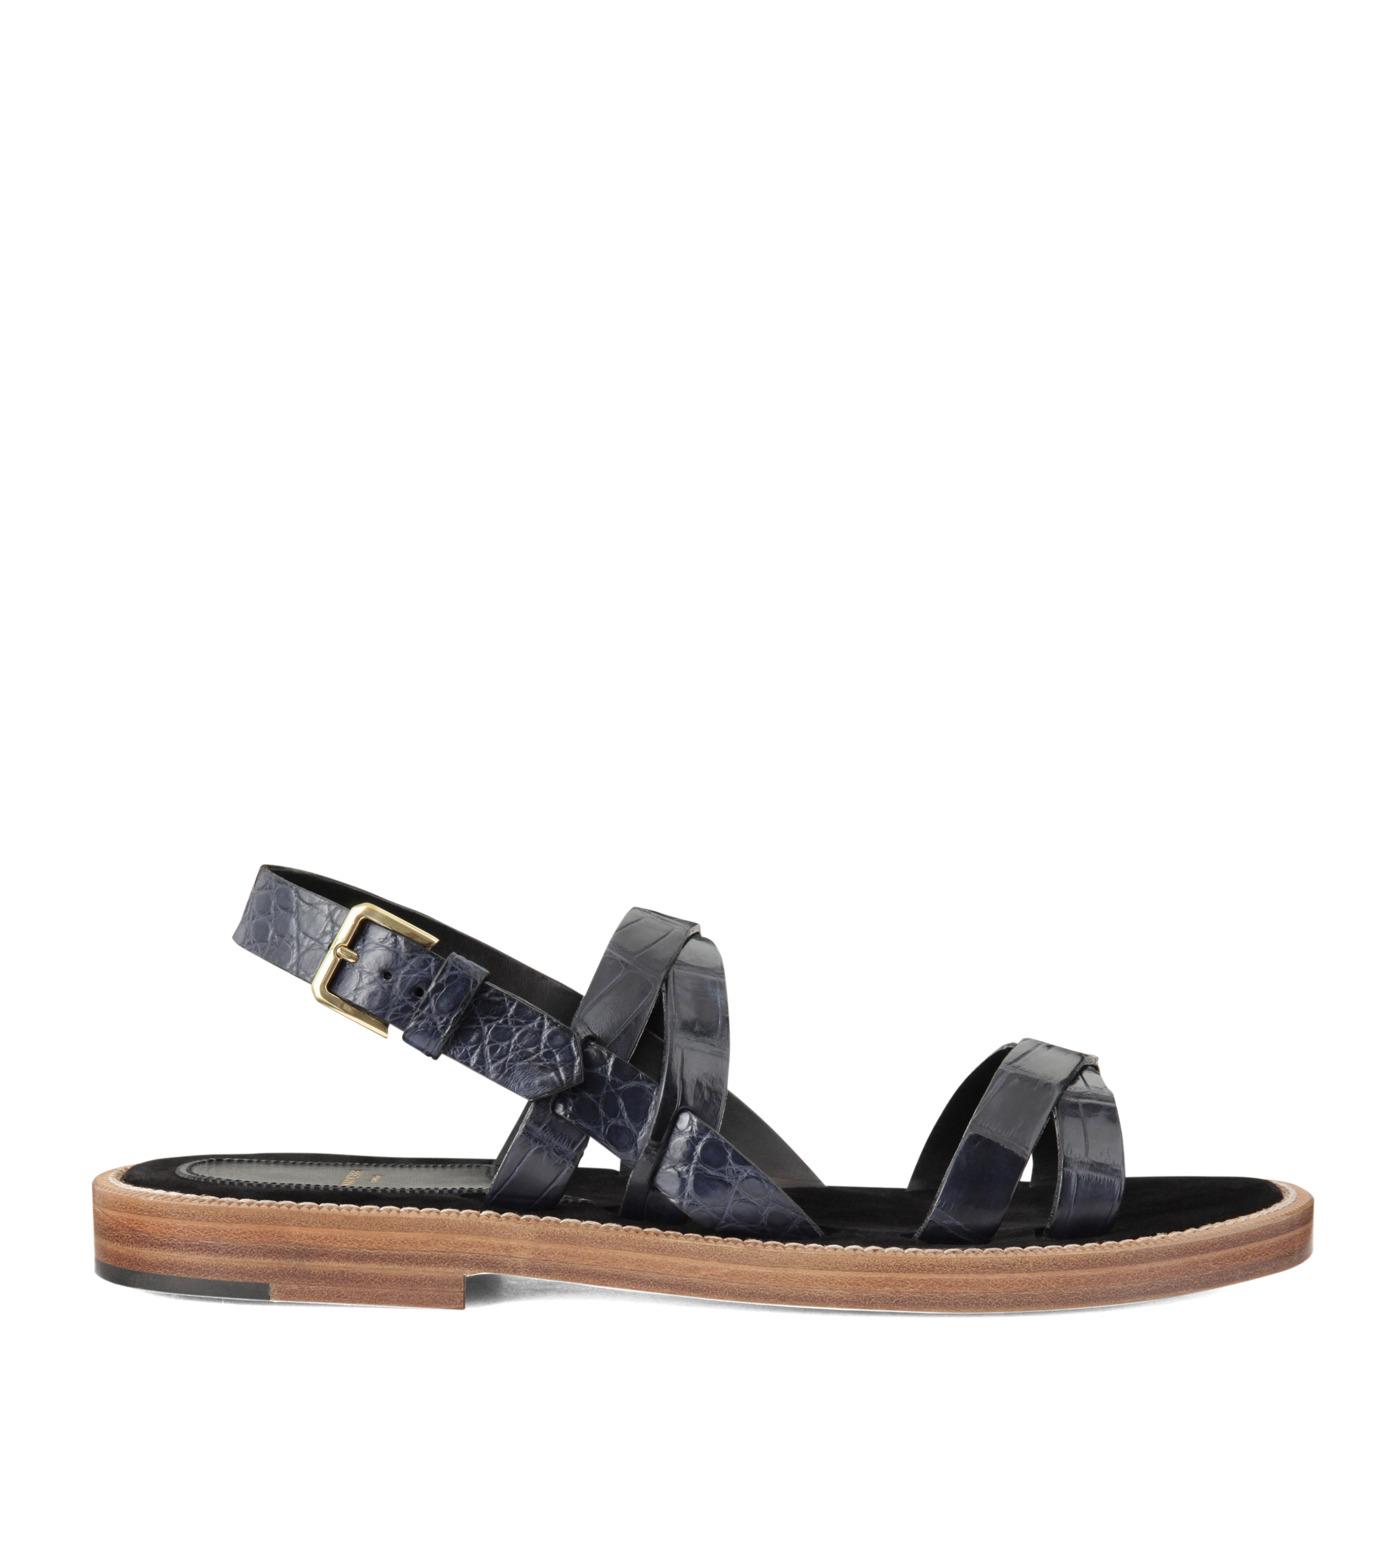 Max Verre(マックス ヴェッレ)のCross Strap Sandal-BLUE(シューズ/shoes)-MV918-POSITA-92 拡大詳細画像1